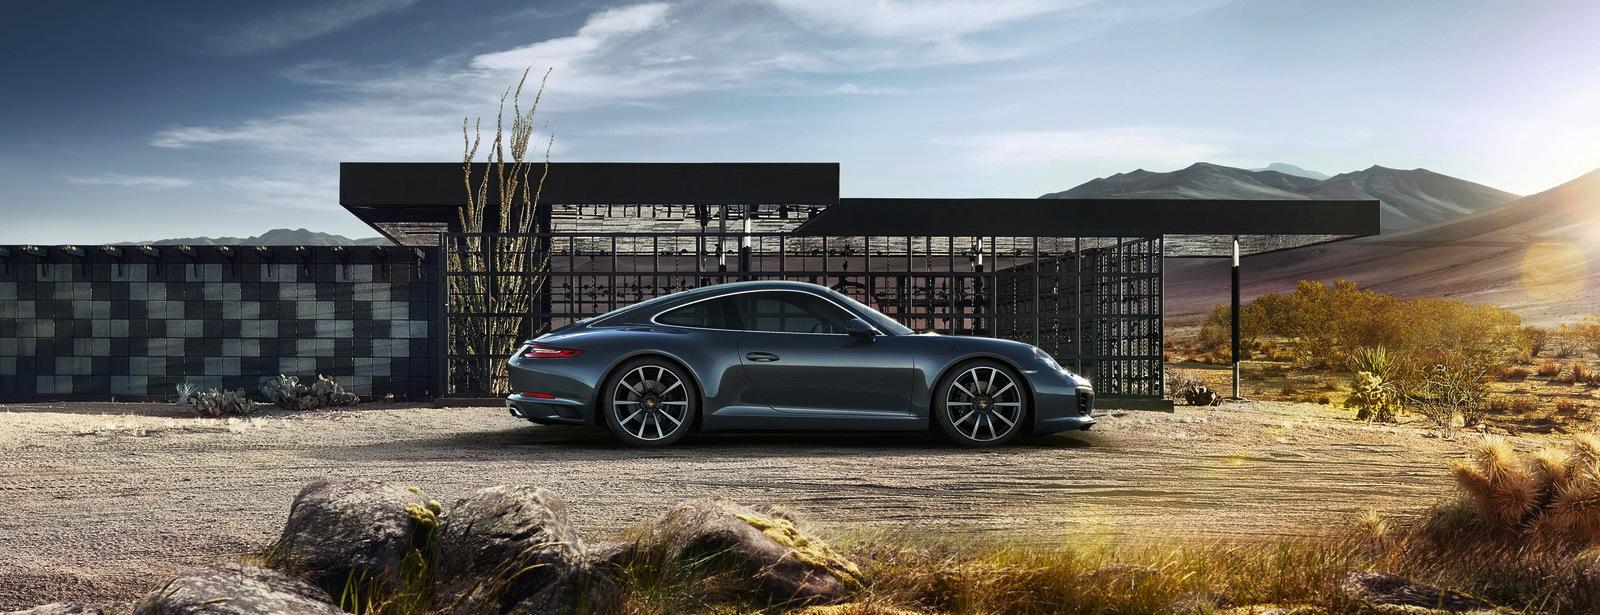 Porsche Los Angeles >> 2015 Porsche 911 Carrera Los Angeles Ca Porsche Dealer